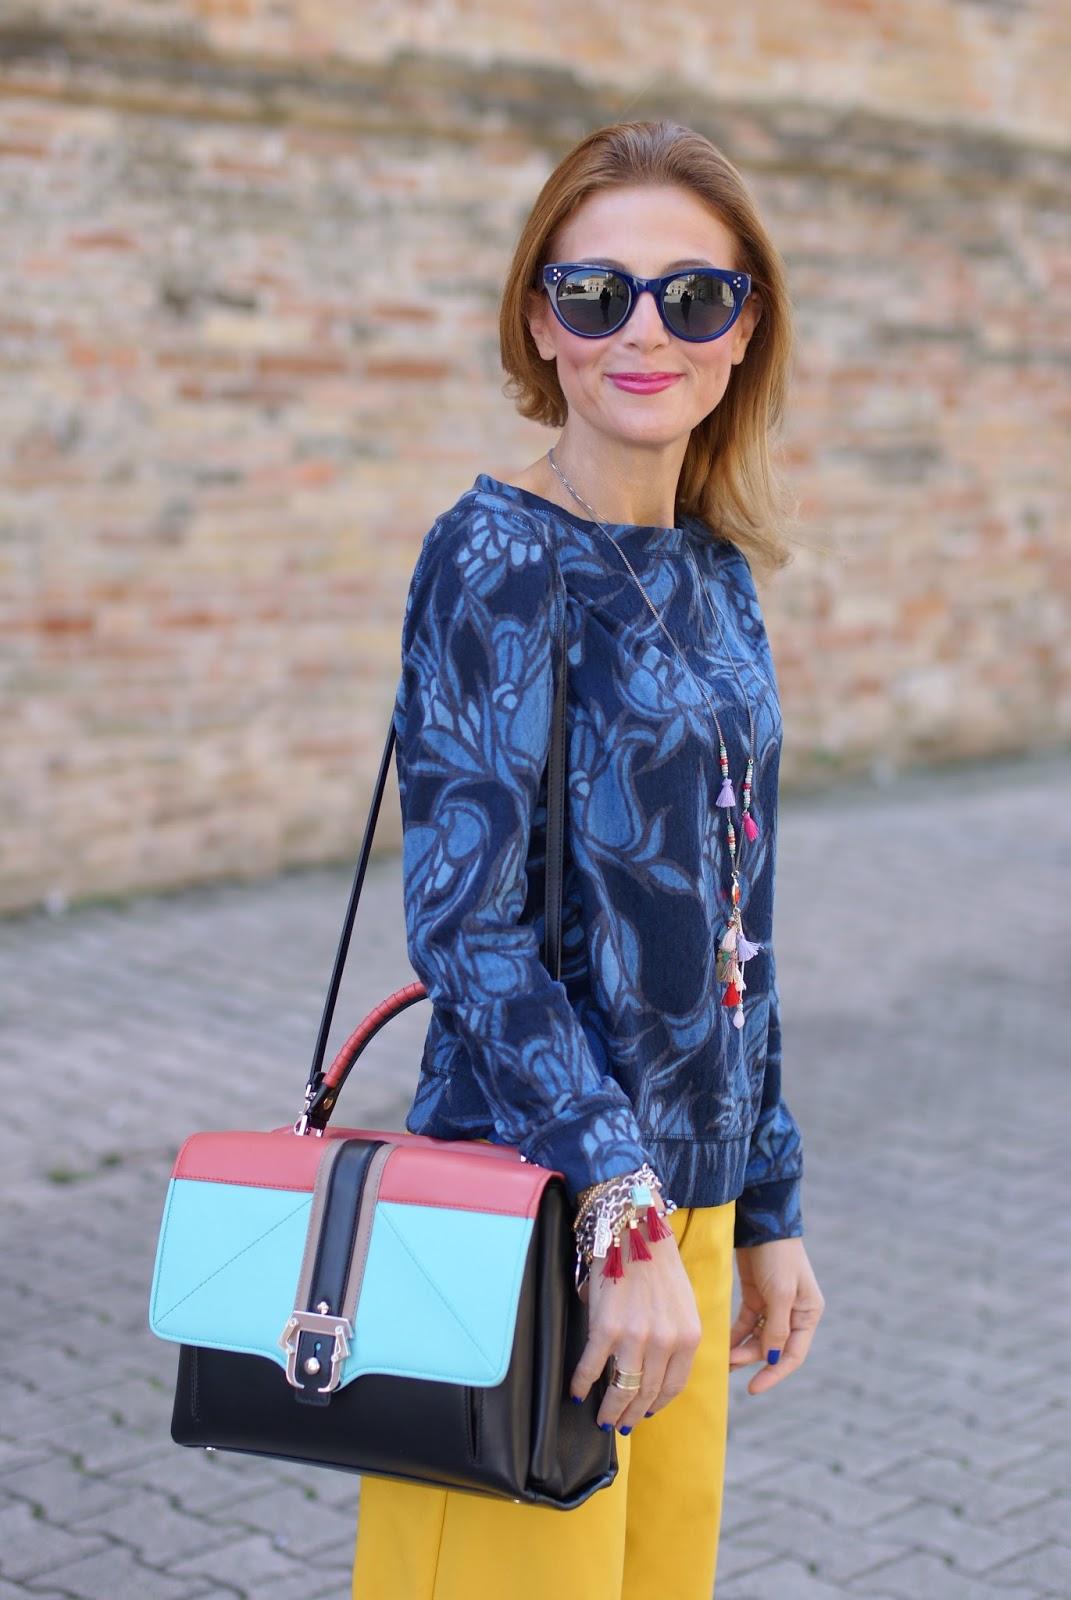 Paula Cademartori Faye handbag, Dolce & Gabbana Sophia Loren lipstck, yellow pants and Hype Glass on Fashion and Cookies fashion blog